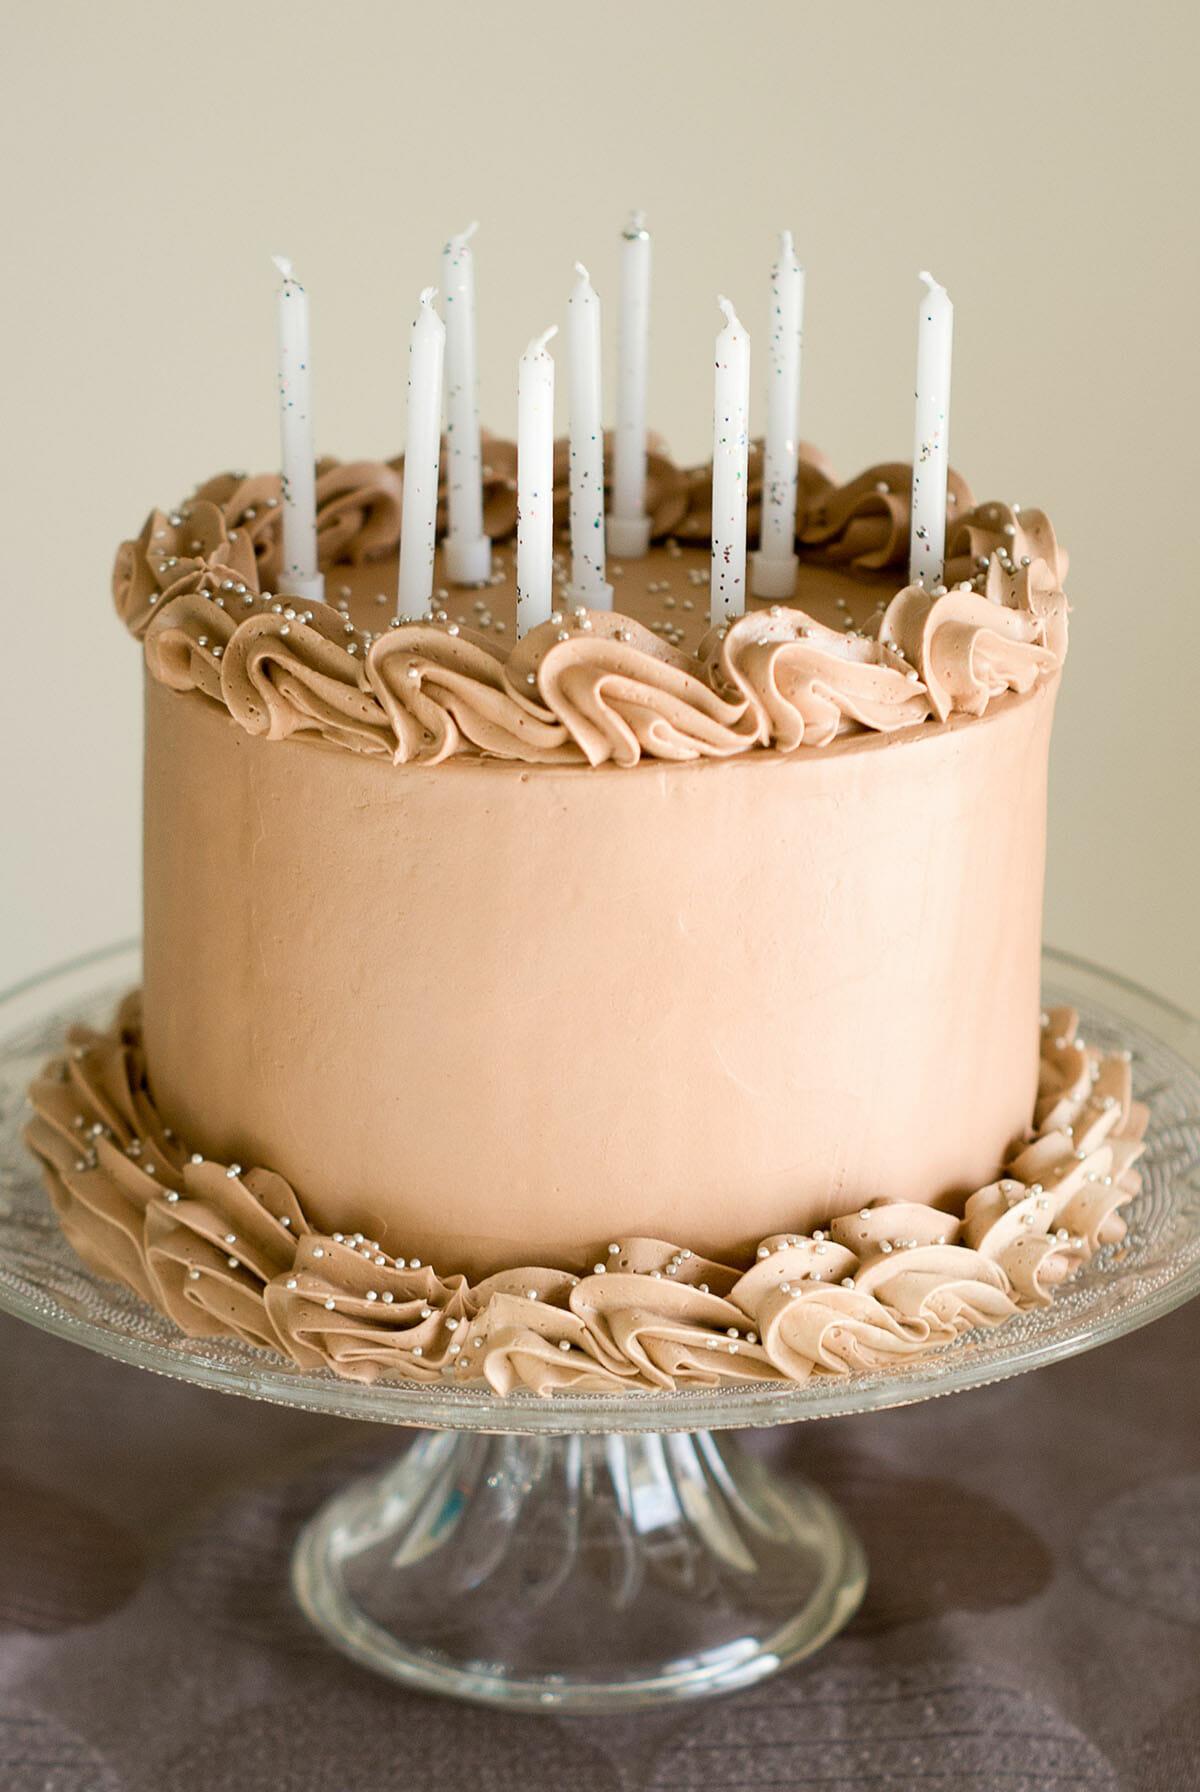 Recette Ganache Pour Layer Cake